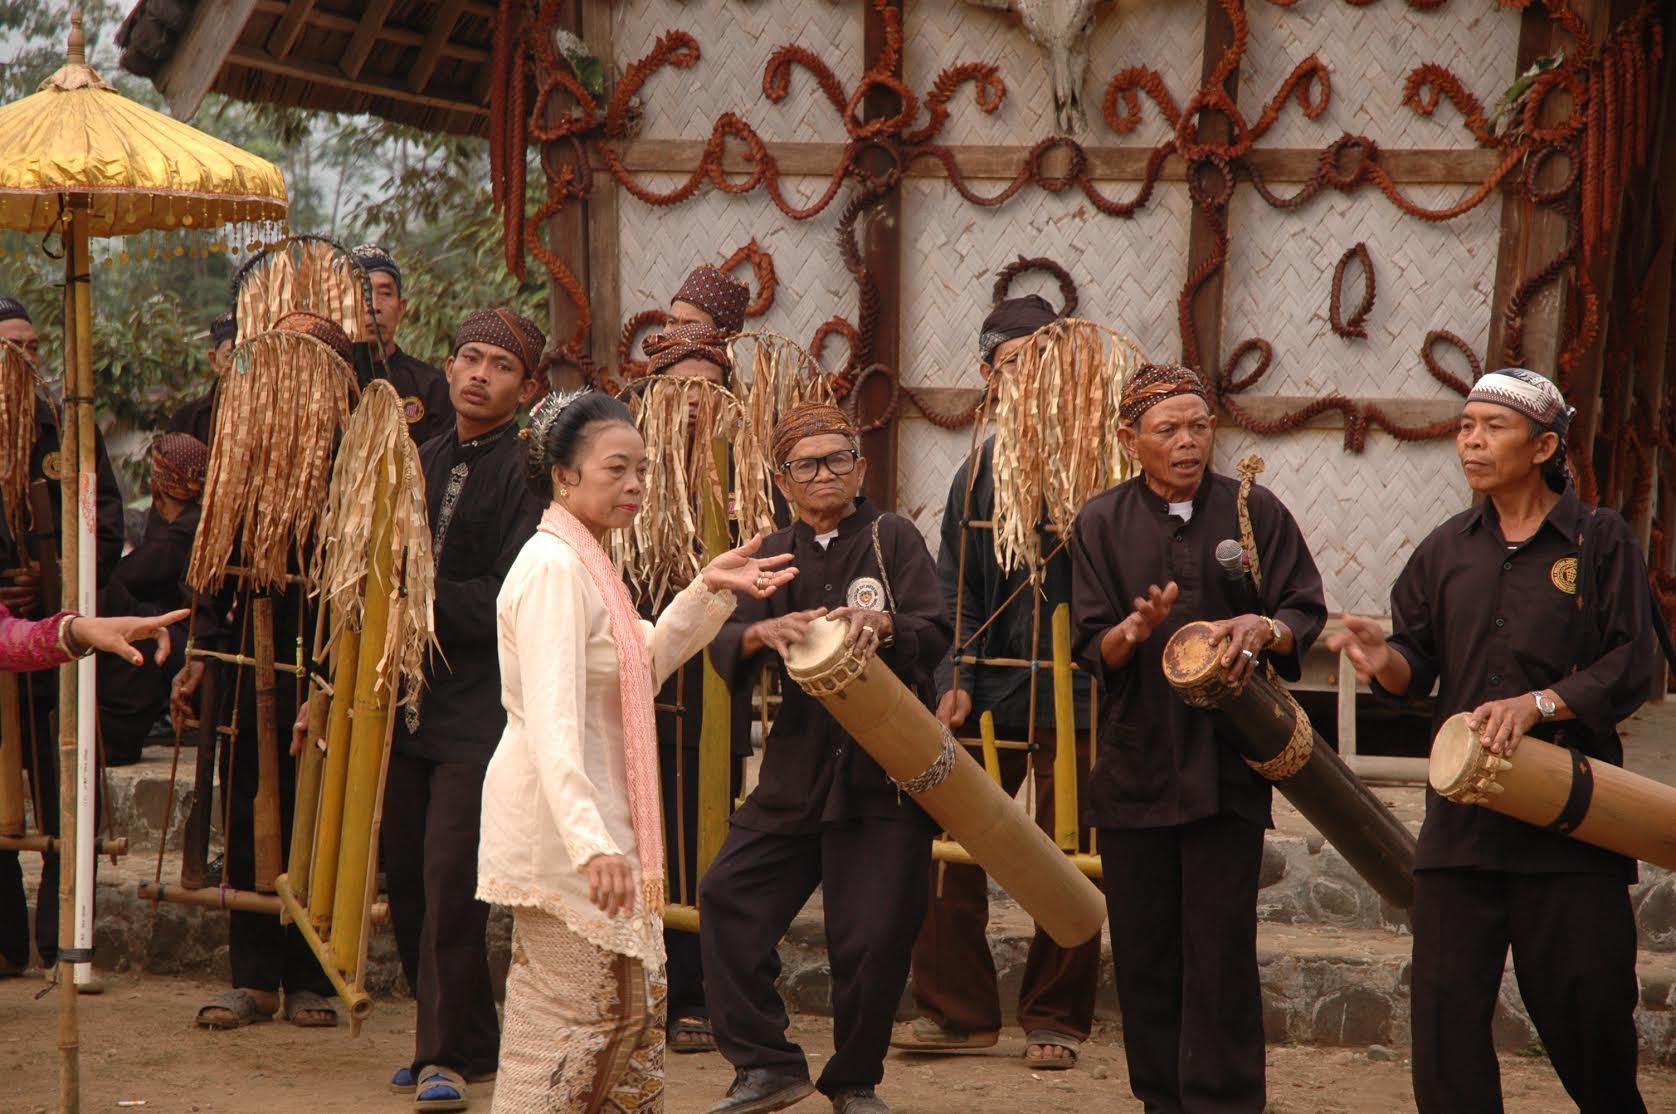 Kesenian Tradisional Meriahkan Ritual Seren Taun Cisungsang Banten 2018